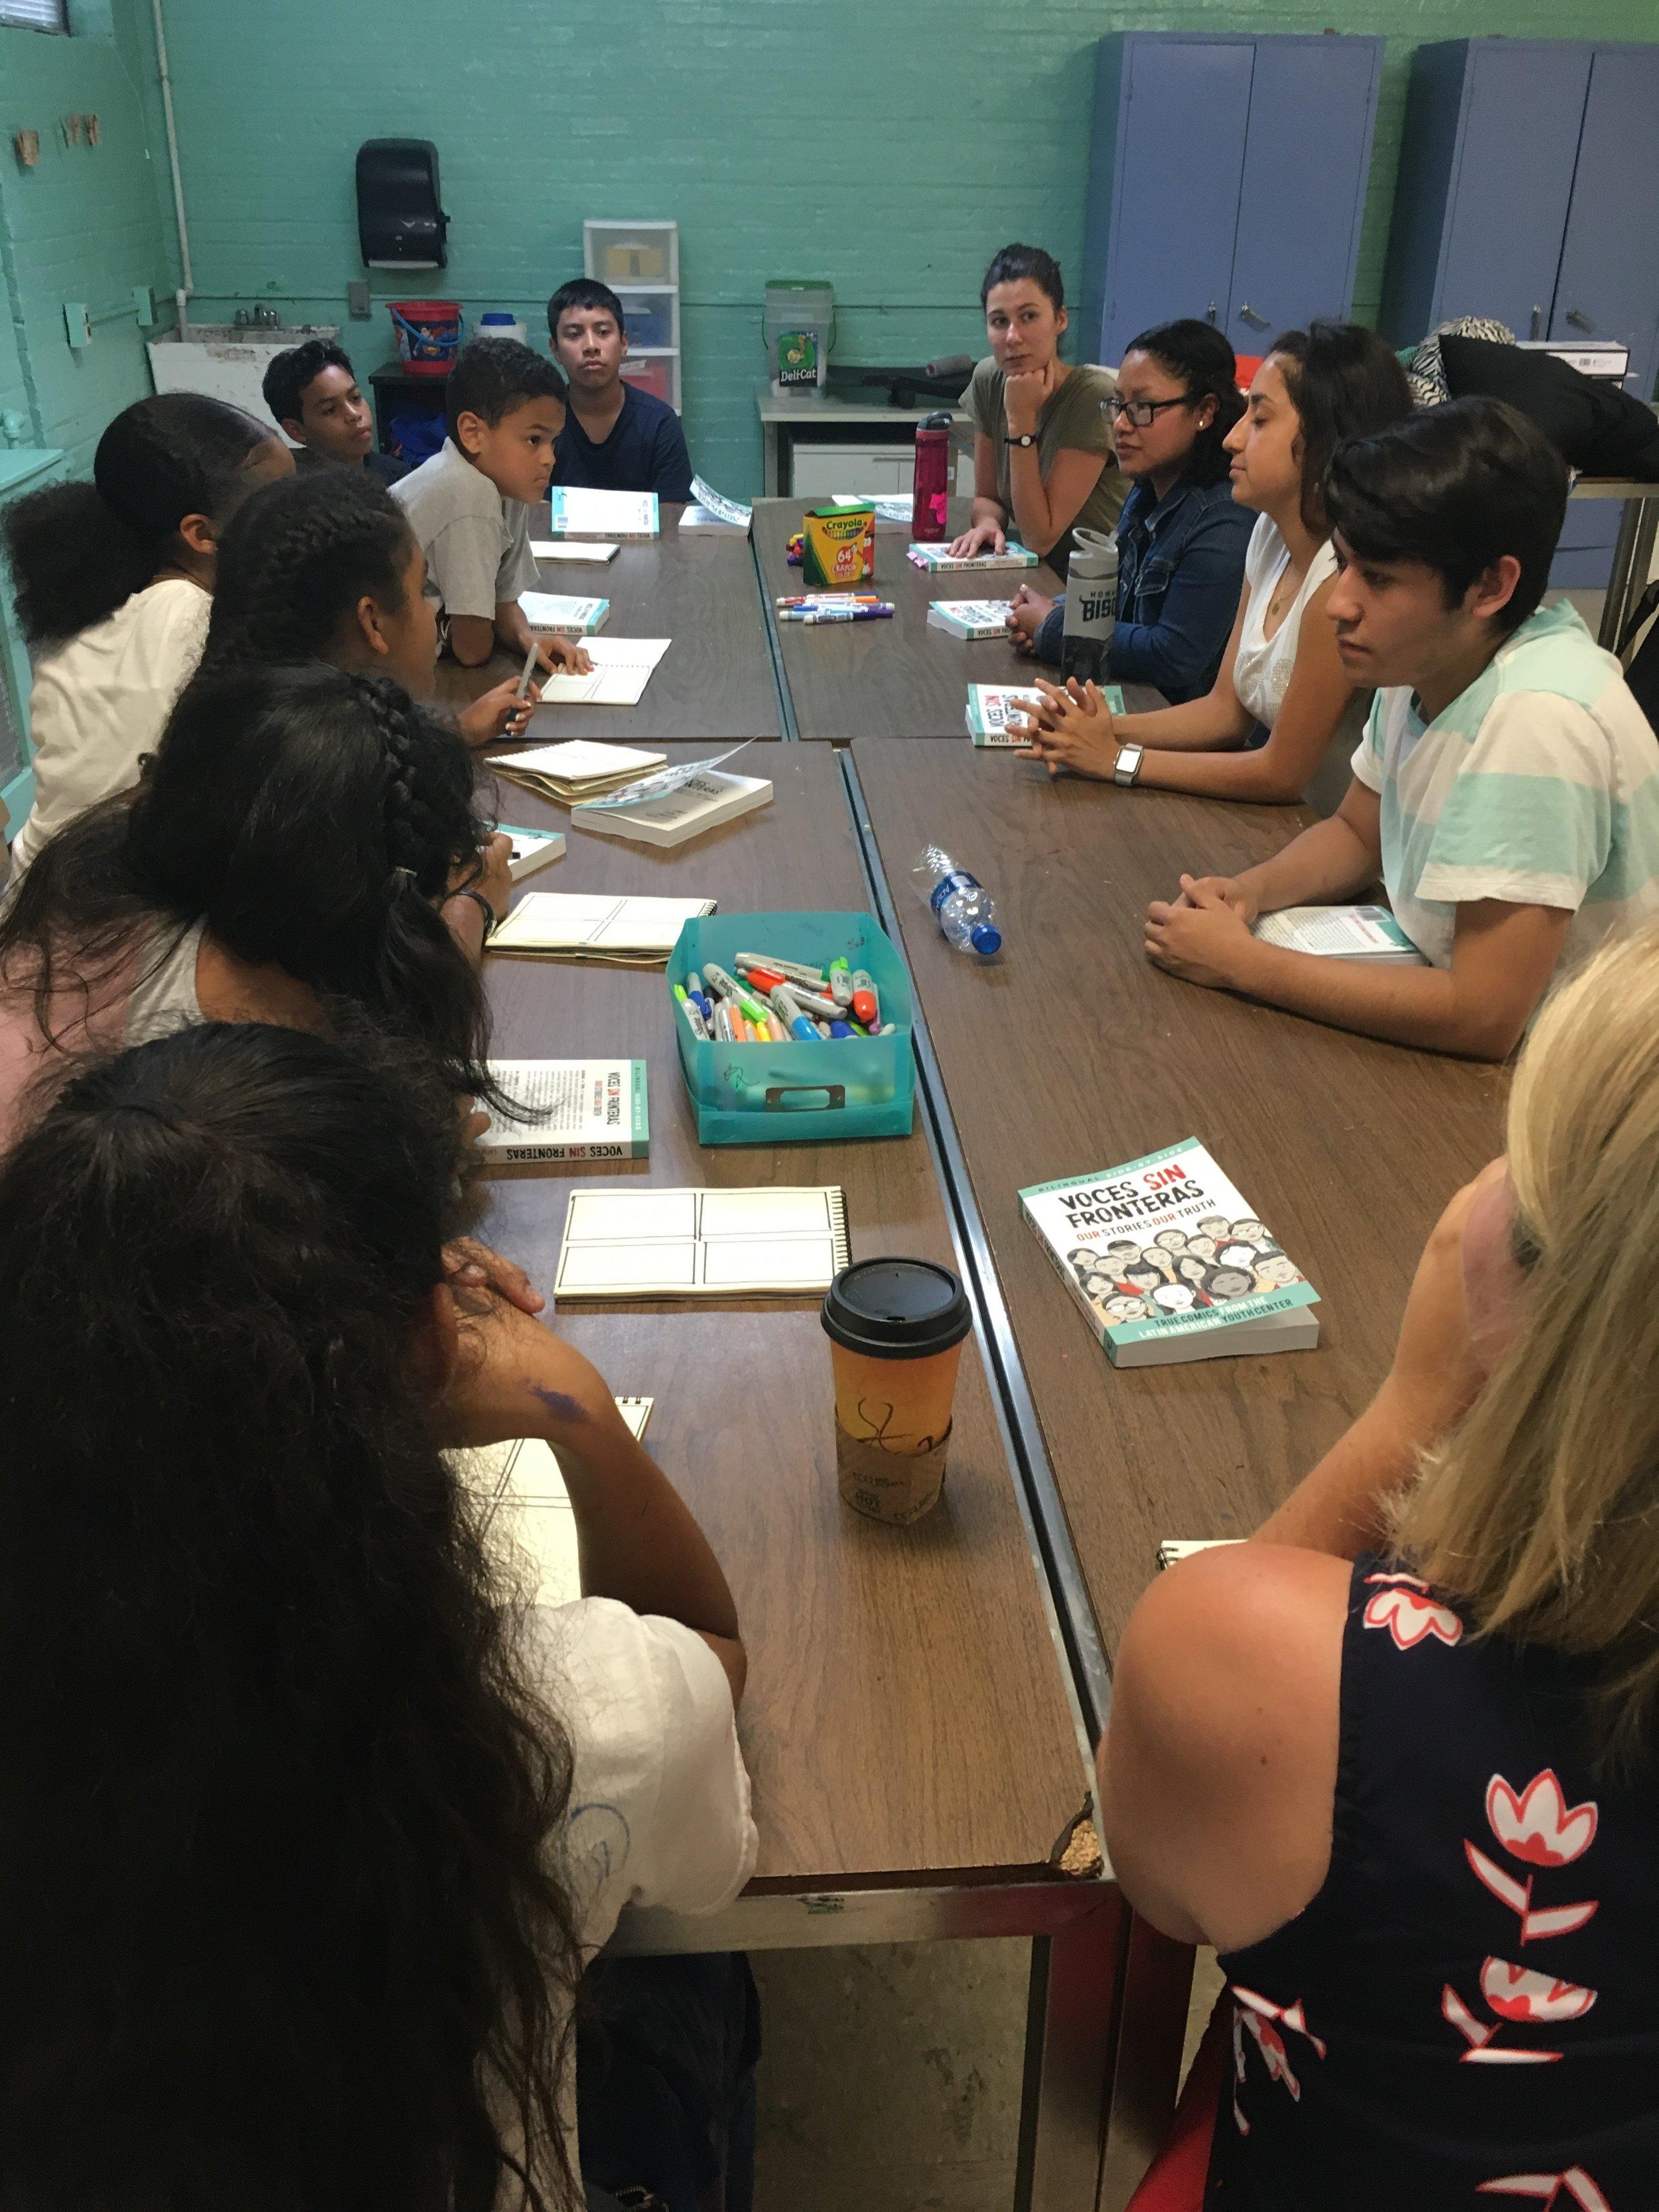 Nuestra Voz Group at Table.JPG